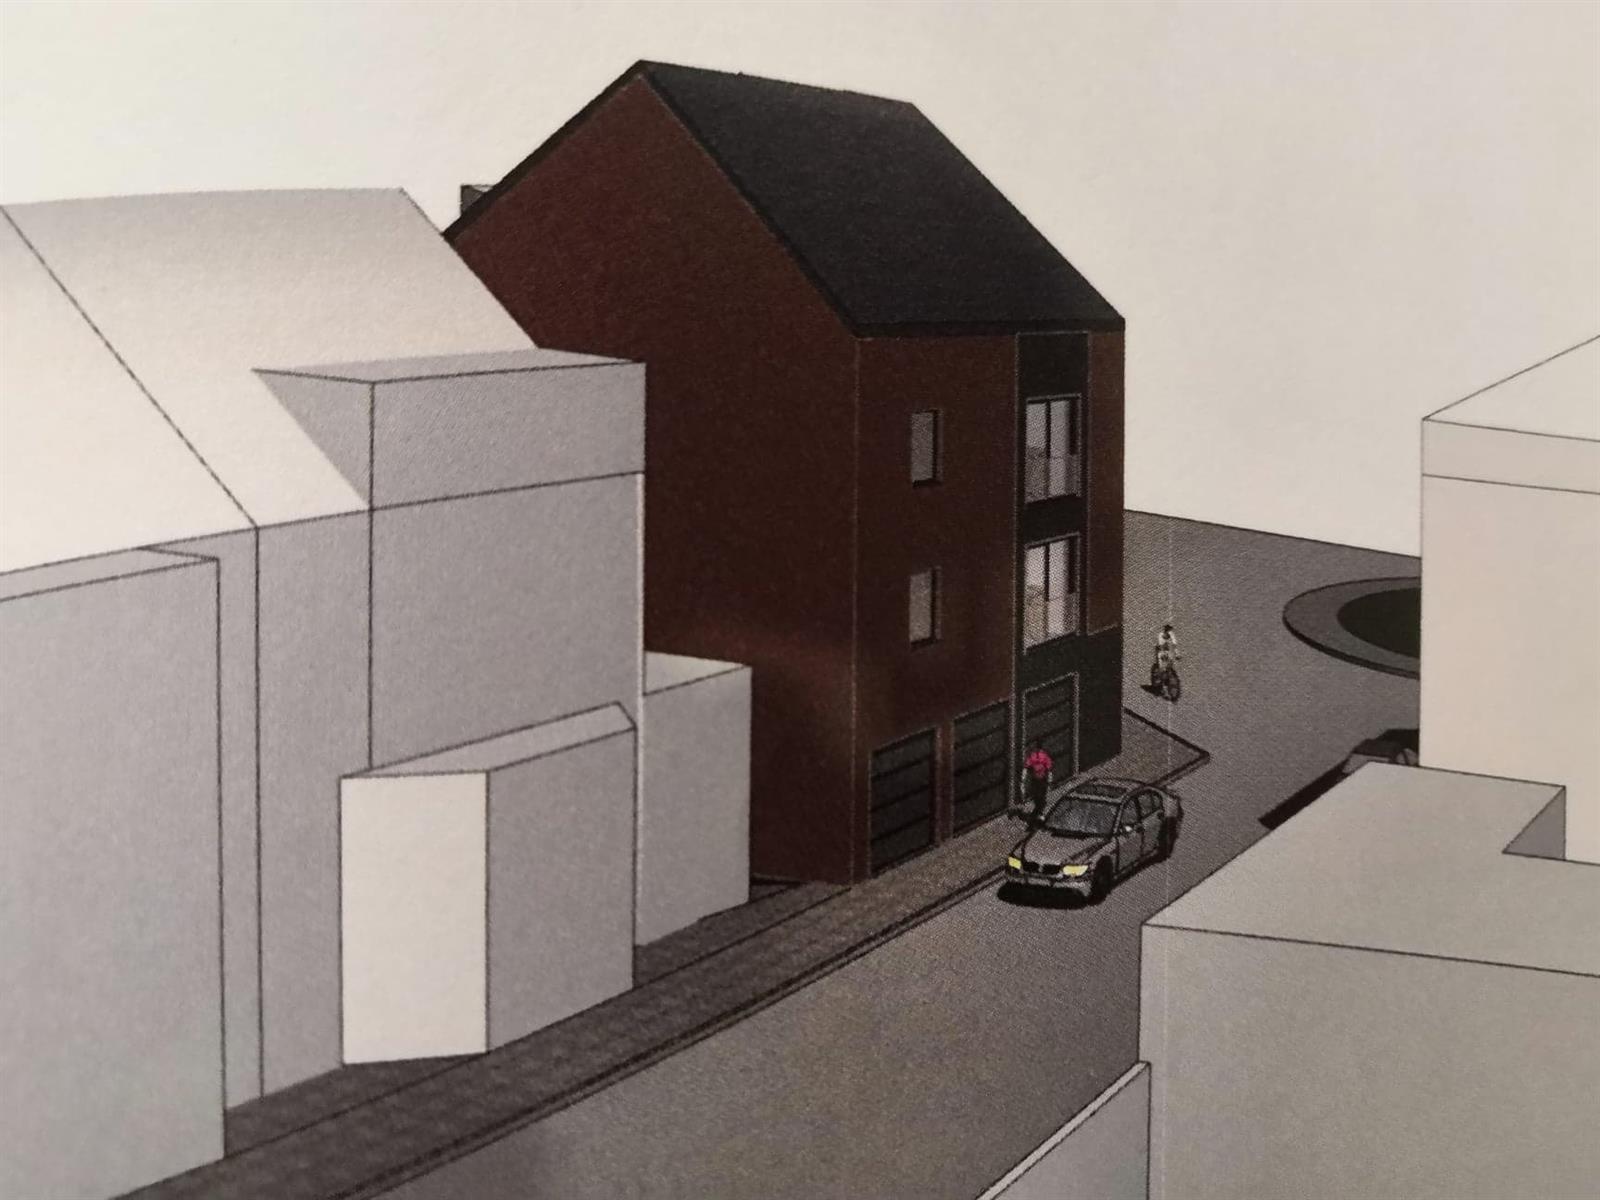 Terrain à bâtir (projets) - Charleroi - #3957840-0